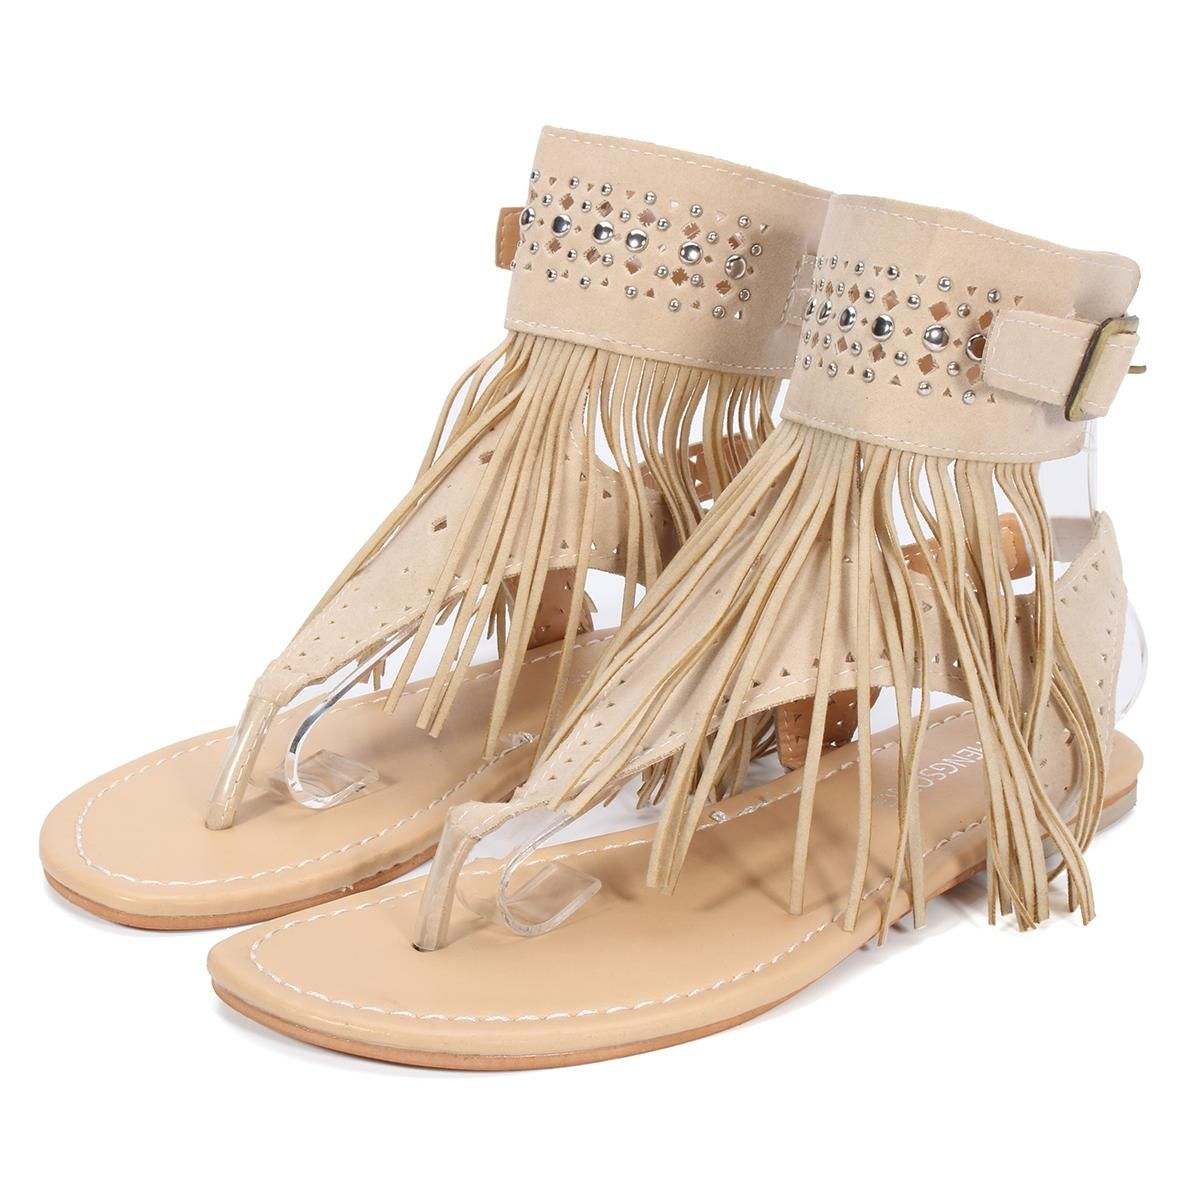 3842da487c5e51 Buy Fashion Fashion Women Summer Tassel Gladiator Buckle Toe Clip Flat  Sandals Bohemian Shoes in Egypt